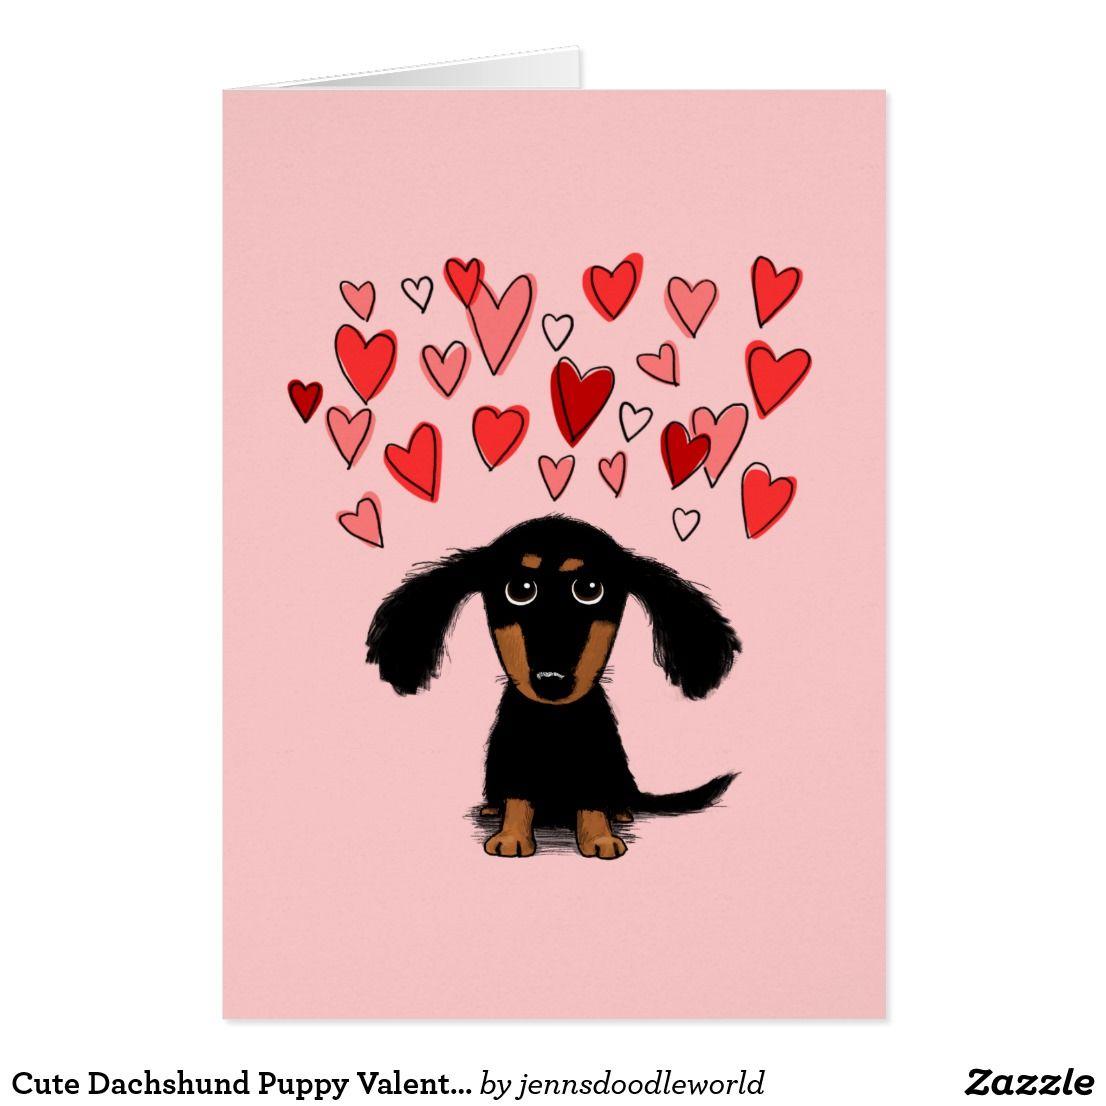 Dachshund clipart i heart. Cute puppy dog valentine